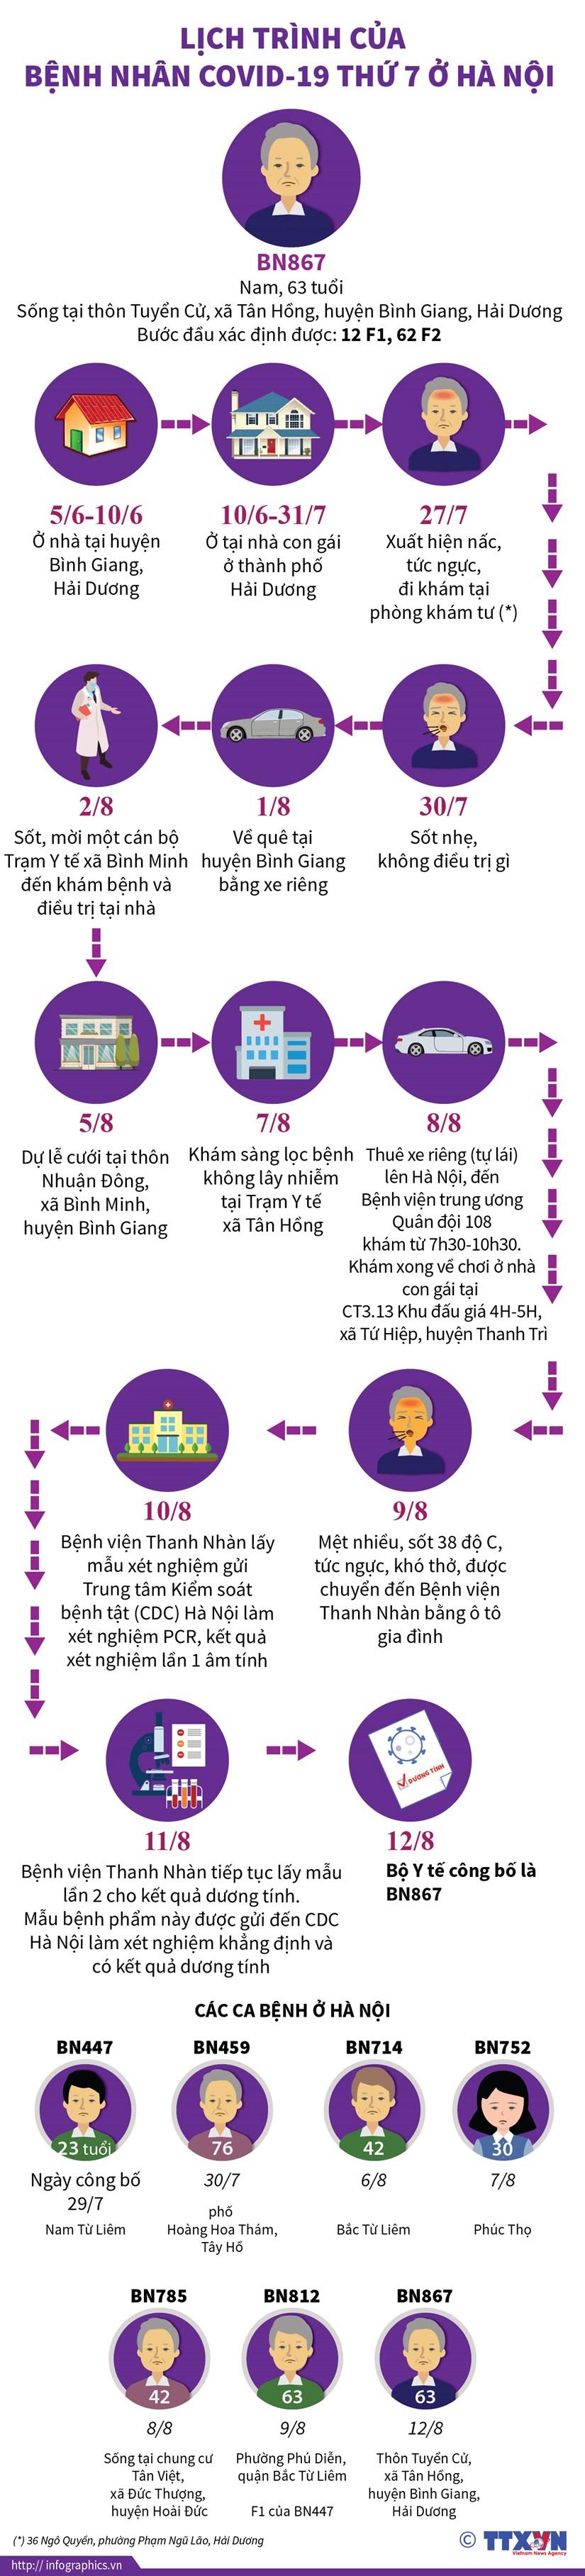 [Infographics] Lich trinh cua benh nhan COVID-19 thu 7 o Ha Noi hinh anh 1